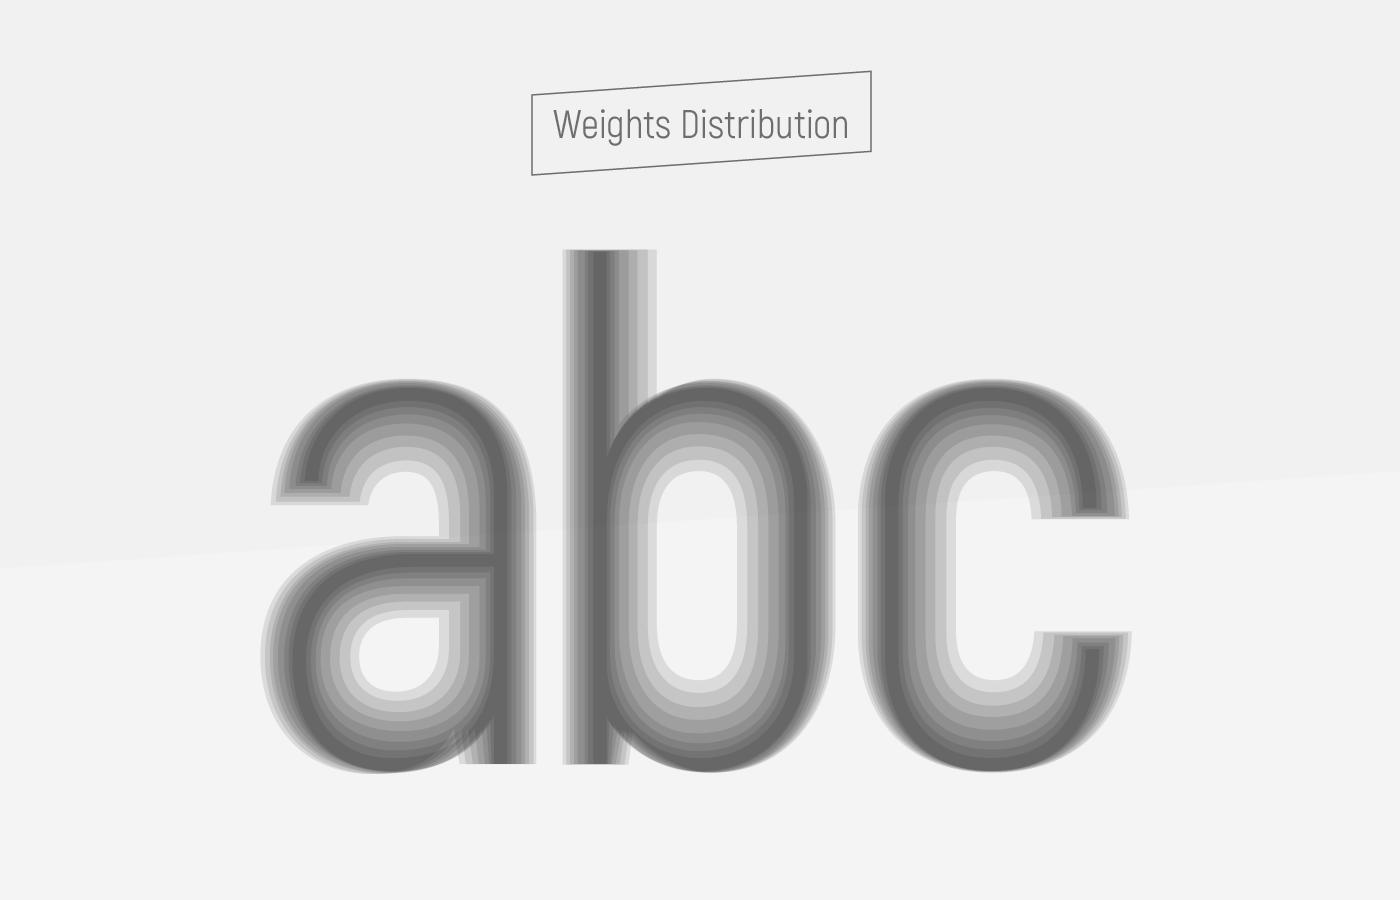 Free font free fonts Typeface narrow condensed sans serif geometry кириллица Cyrillic Latin extended latin akrobat Akrobat free Akrobat font